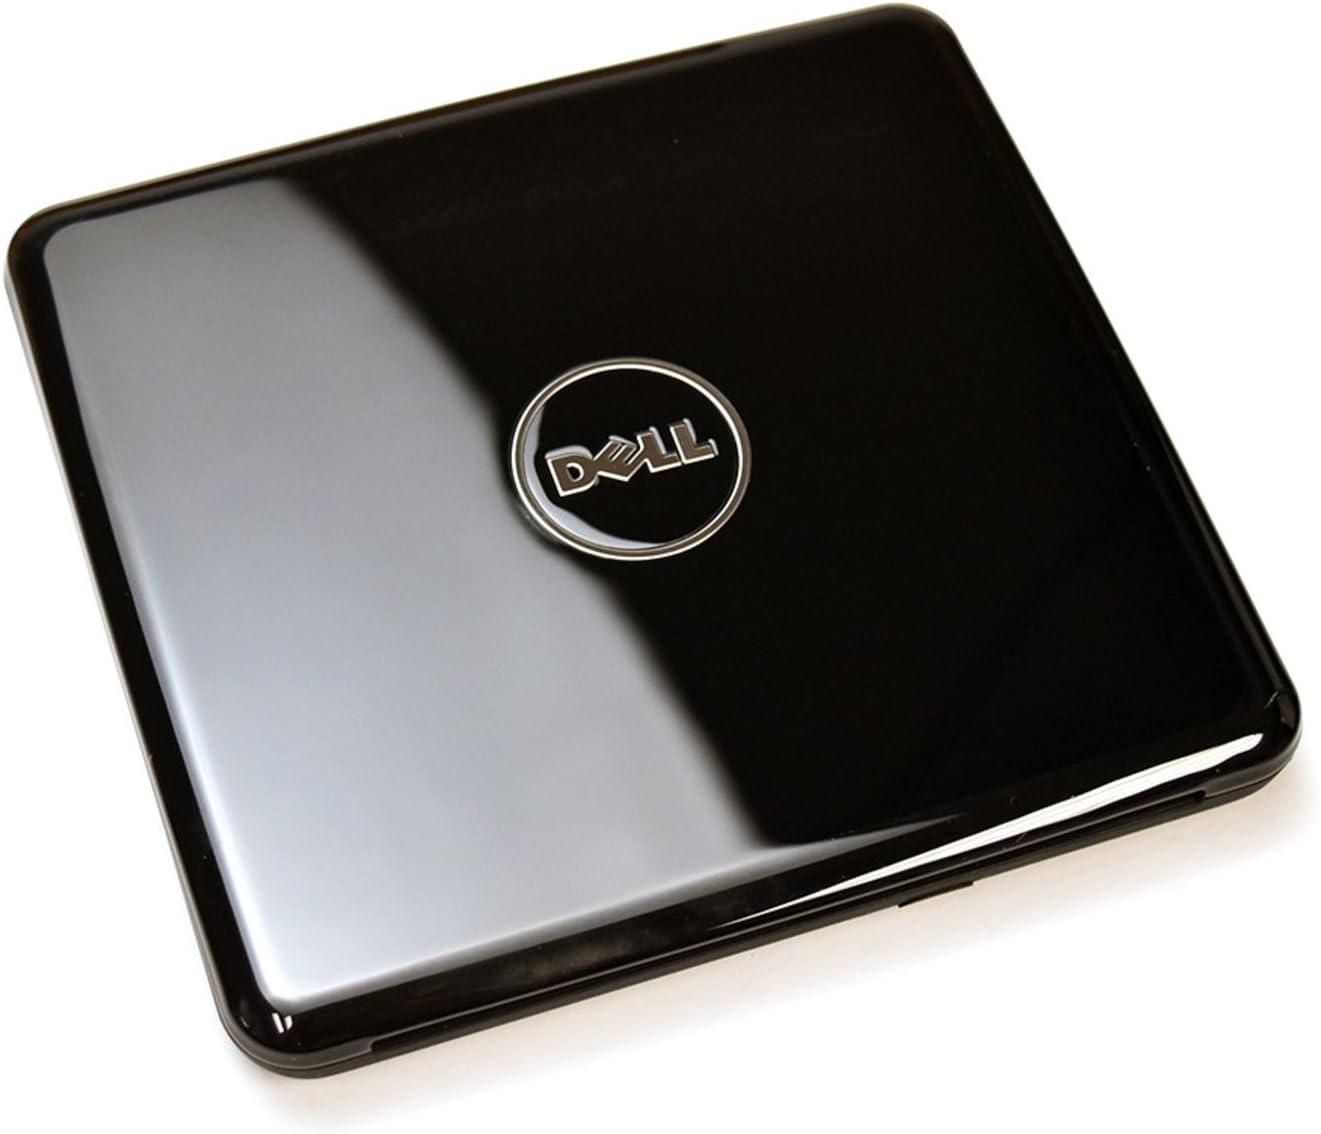 Aquamoon Trading New GX10N Genuine Dell GPK9C OEM USB Optical Drive External USB DVDRW Drive ODD Multi-Recording LGE-DMGP60N(B) CTYDR RJHFR 5GTT7 8H1N5 RVX09 X130M GP60N DVD+/-RW HLDS